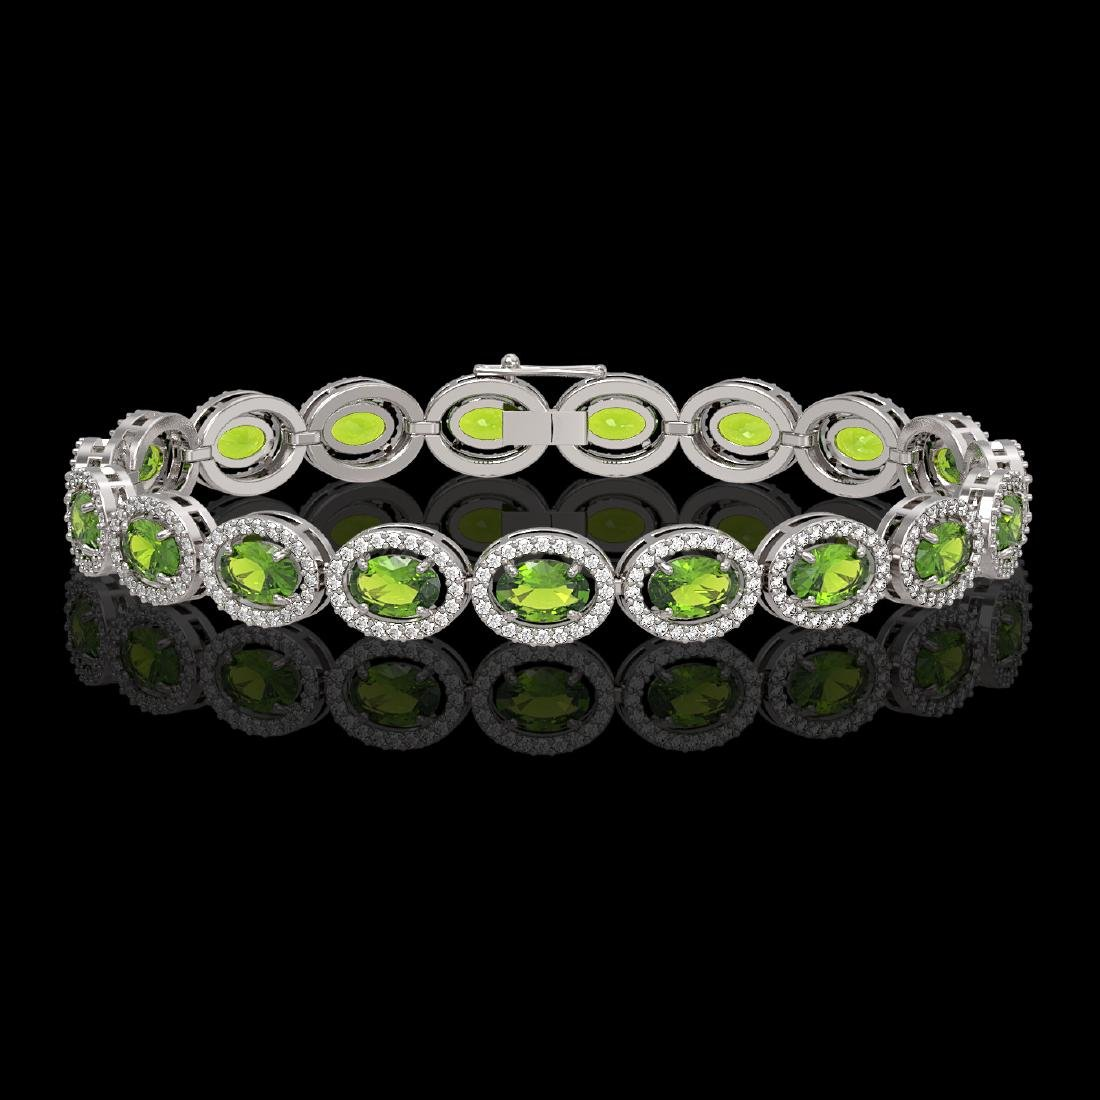 13.87 CTW Peridot & Diamond Halo Bracelet 10K White